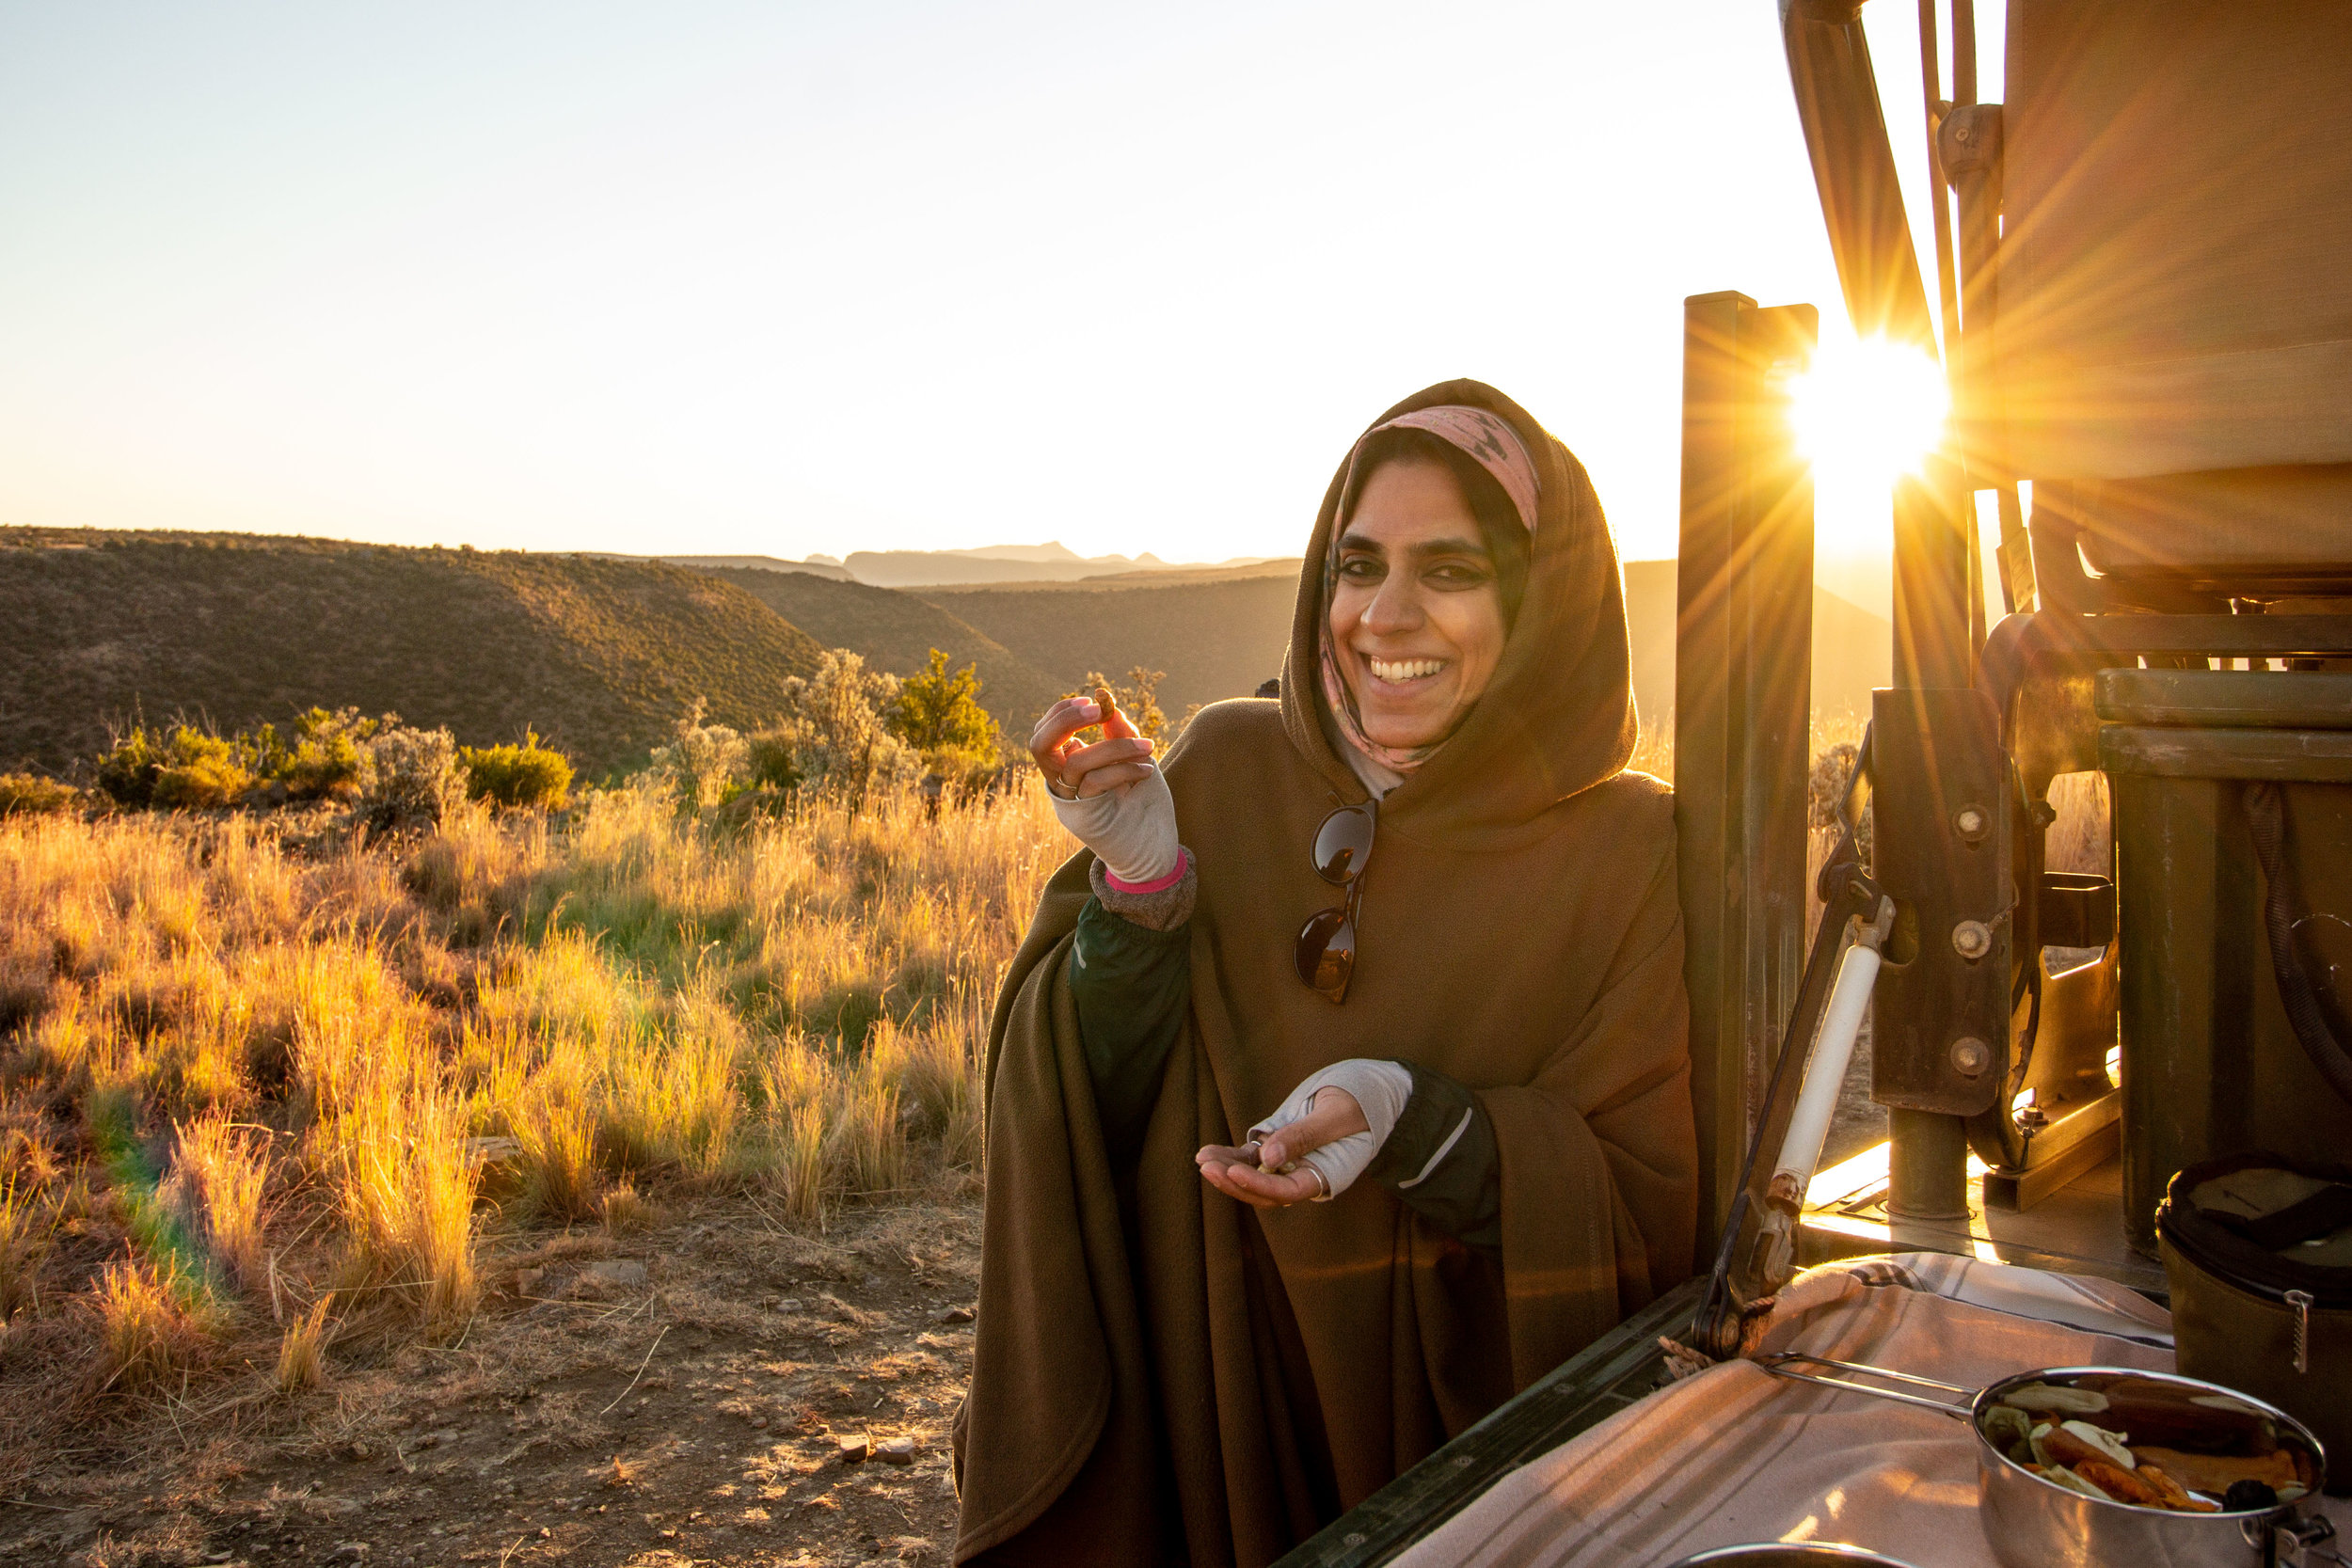 Hi, I'm Fatima, a photographer and artist -